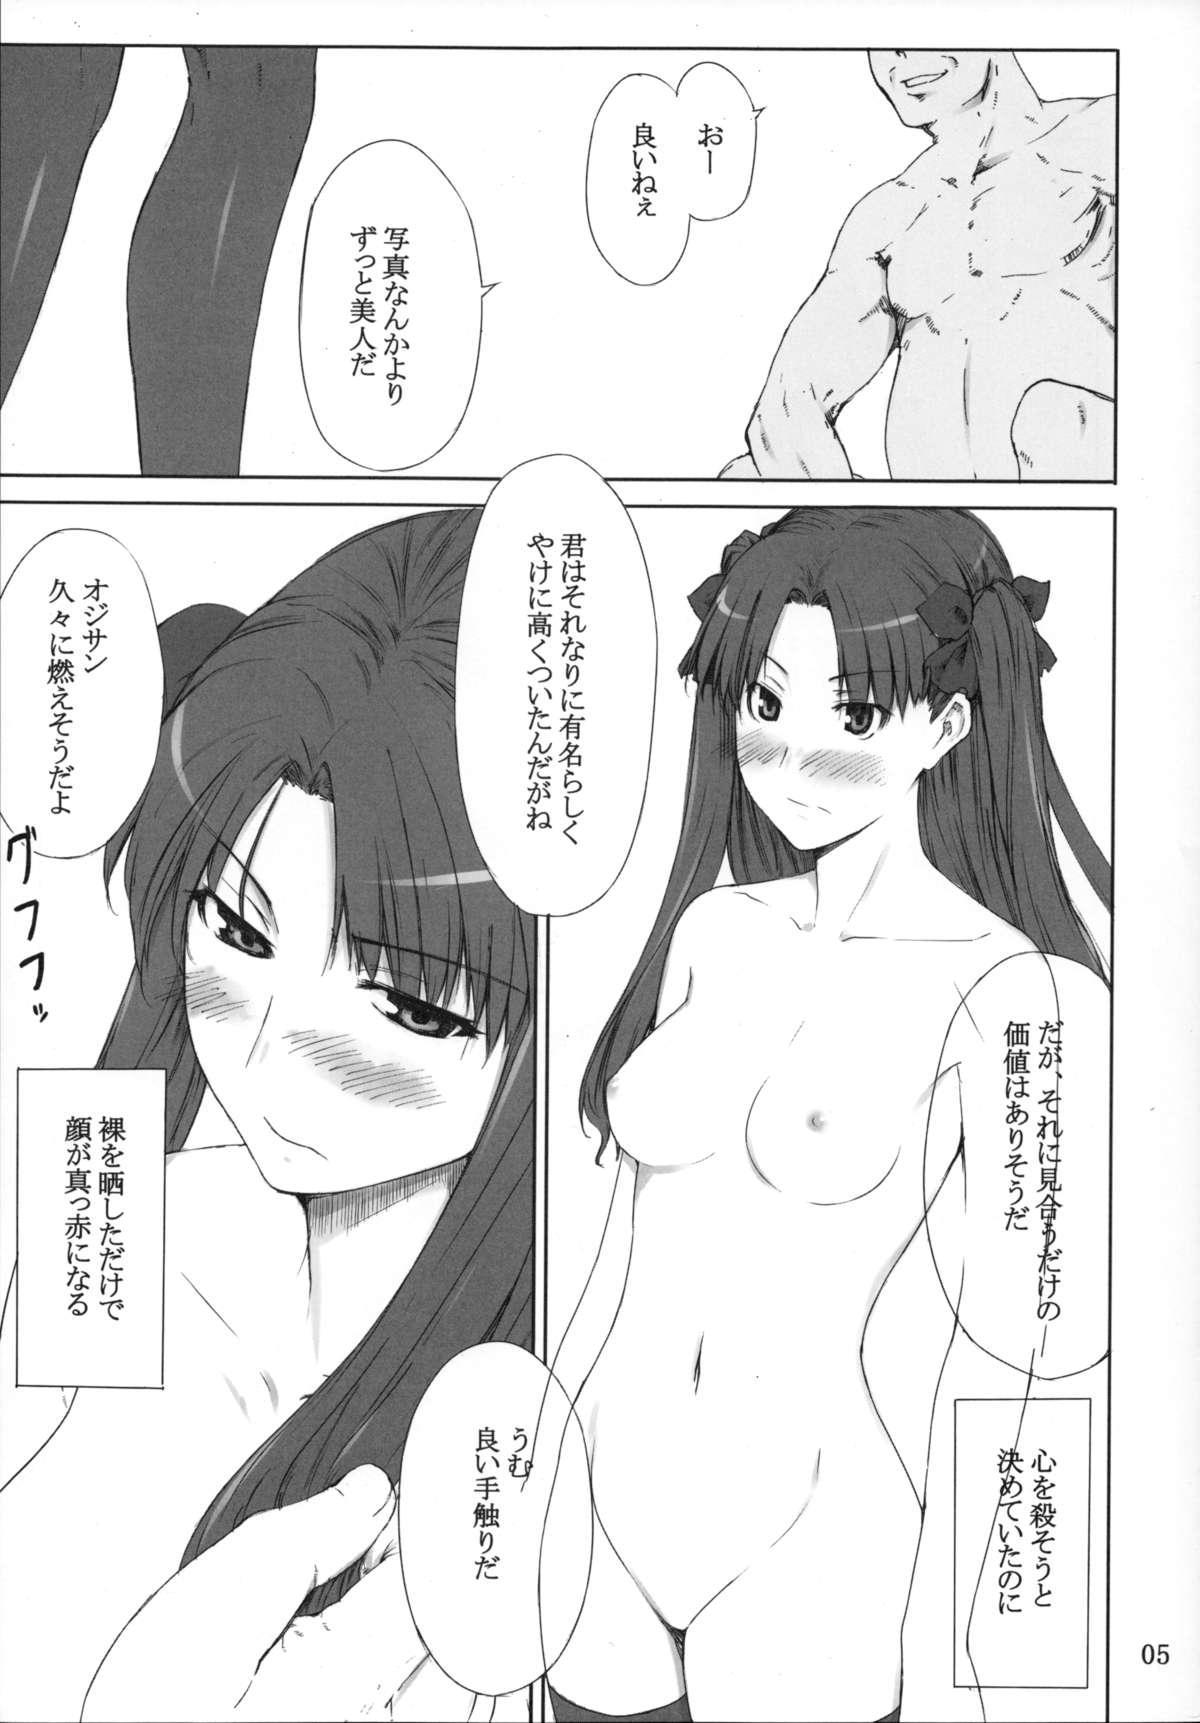 Tosaka-ke no Kakei Jijou Soushuuhen 1 4